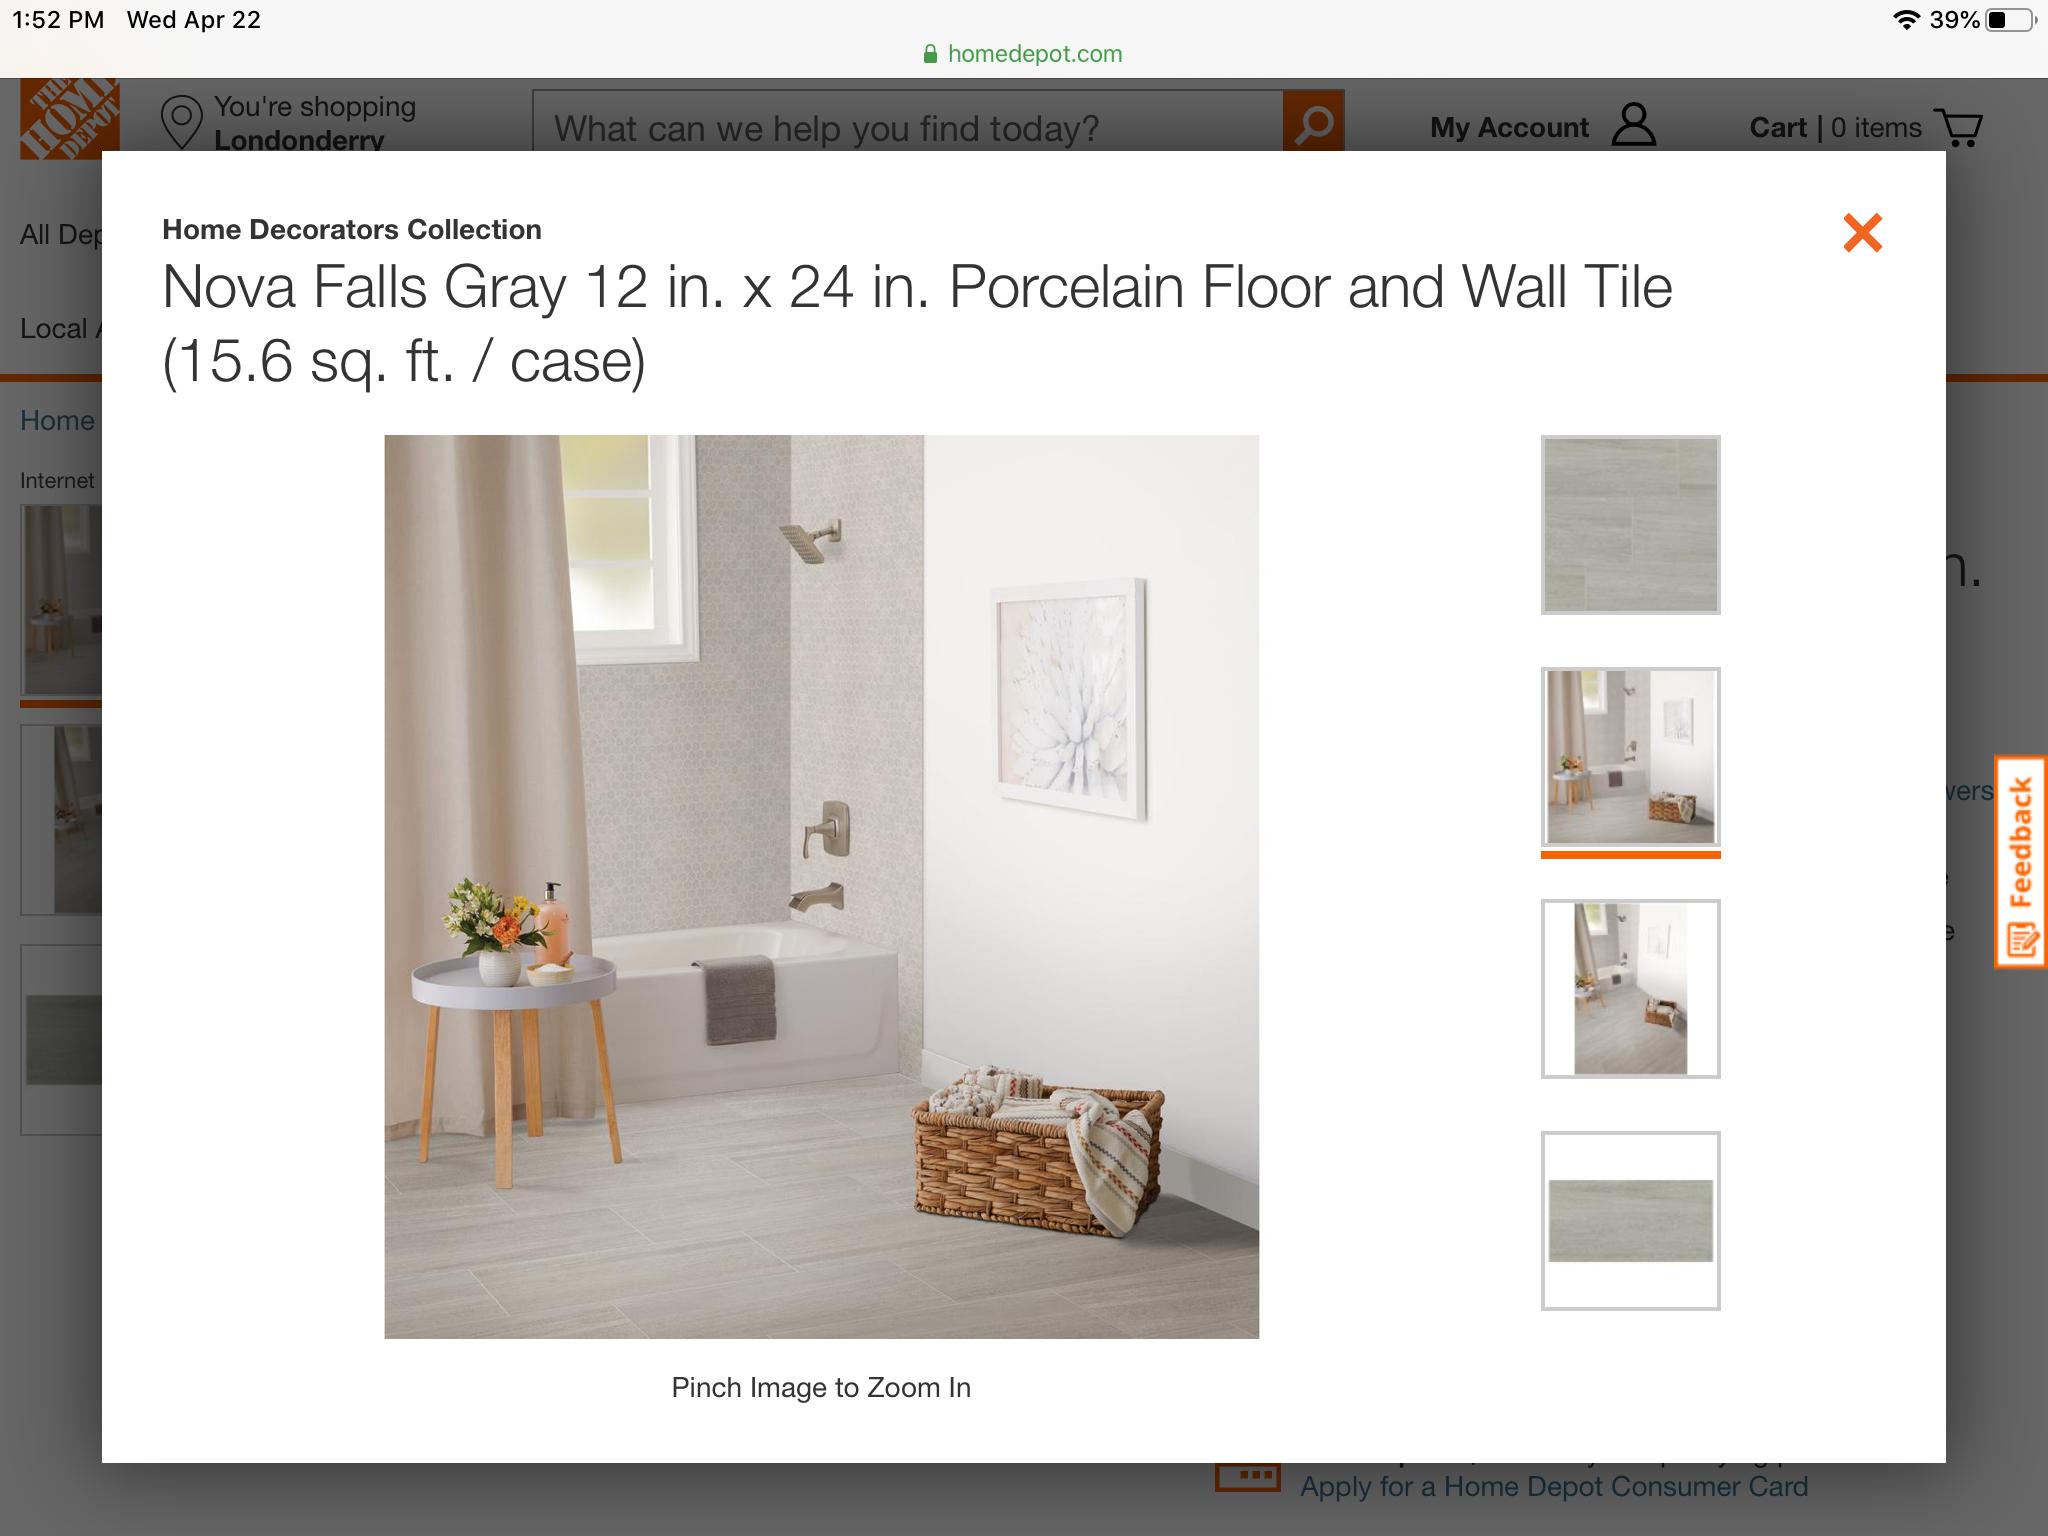 Possible Kids Bathroom Floor 12x24 Inch Tiles In 2020 Home Decorators Collection Floor And Wall Tile Wall Tiles